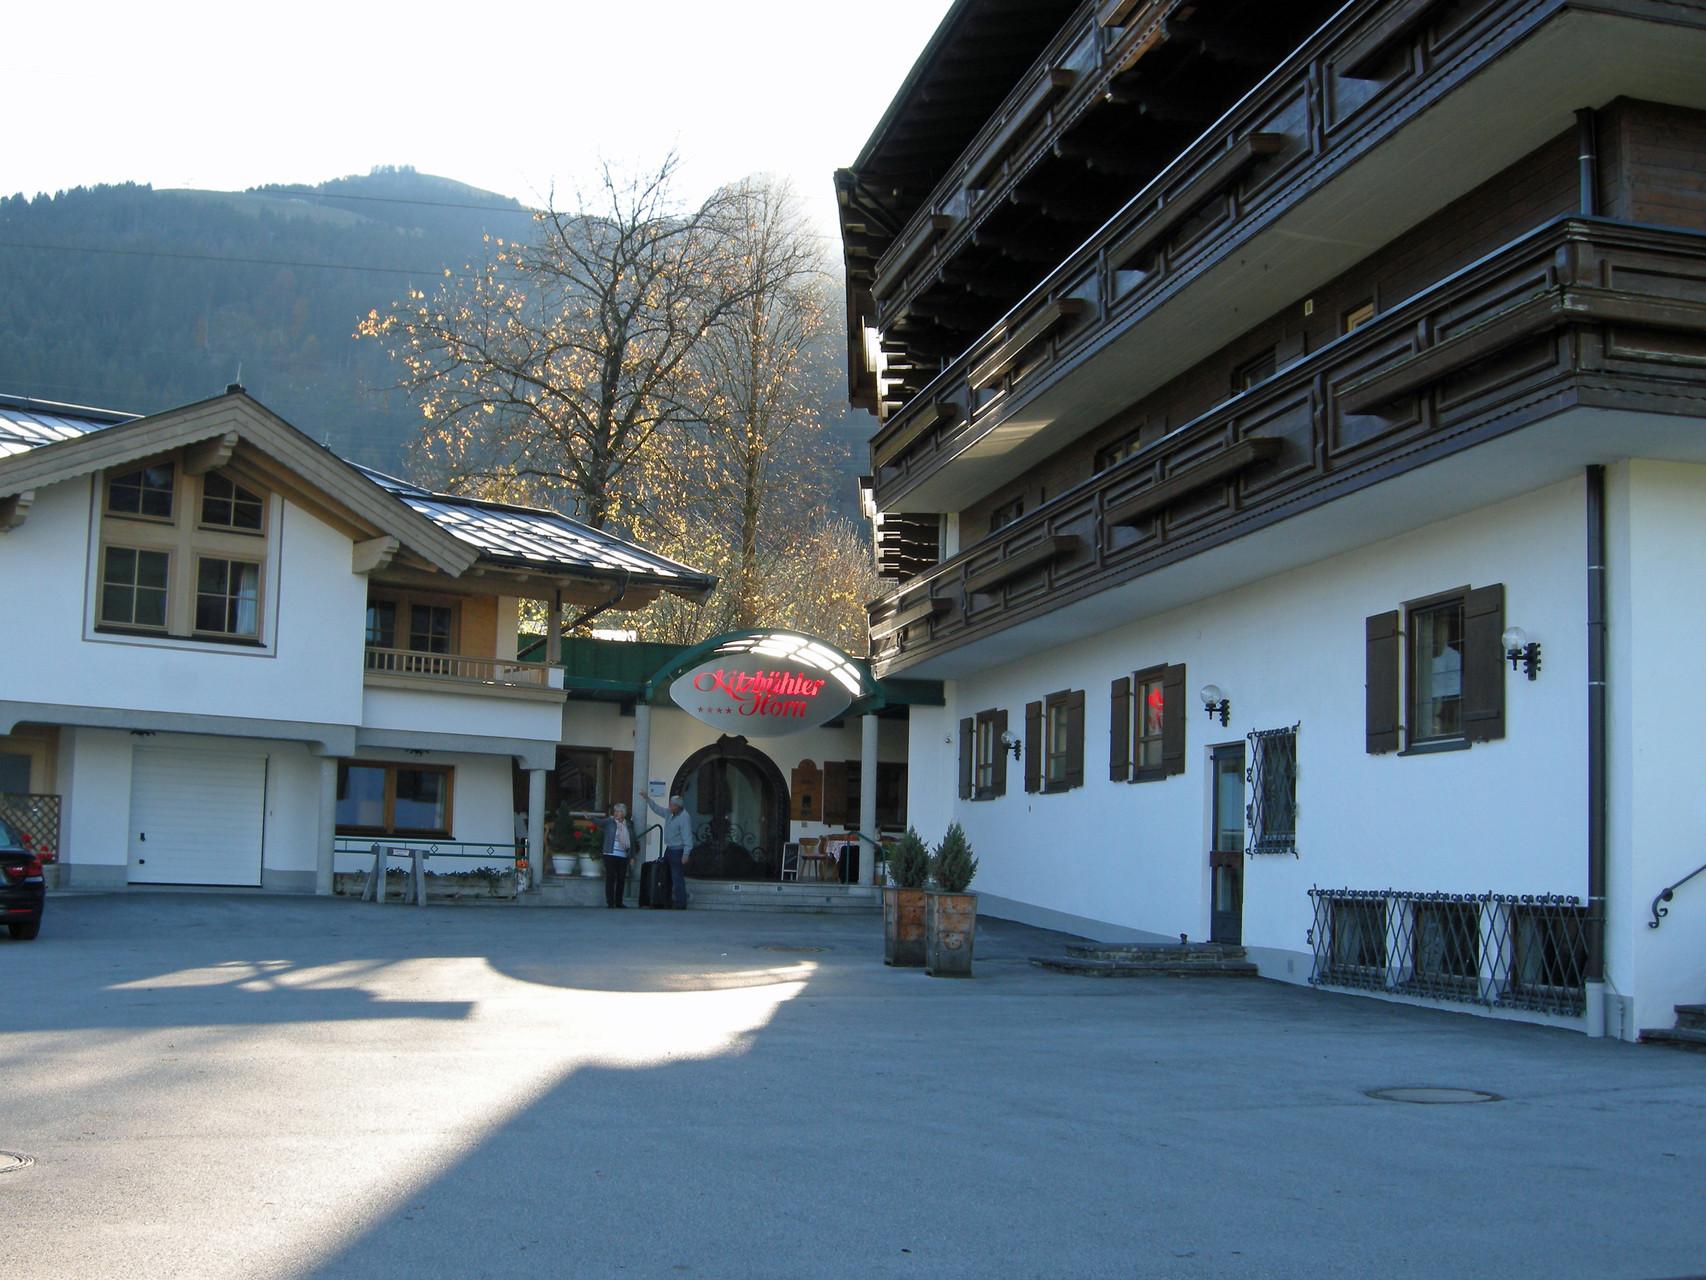 Ankunft in Oberndorf im Tirol